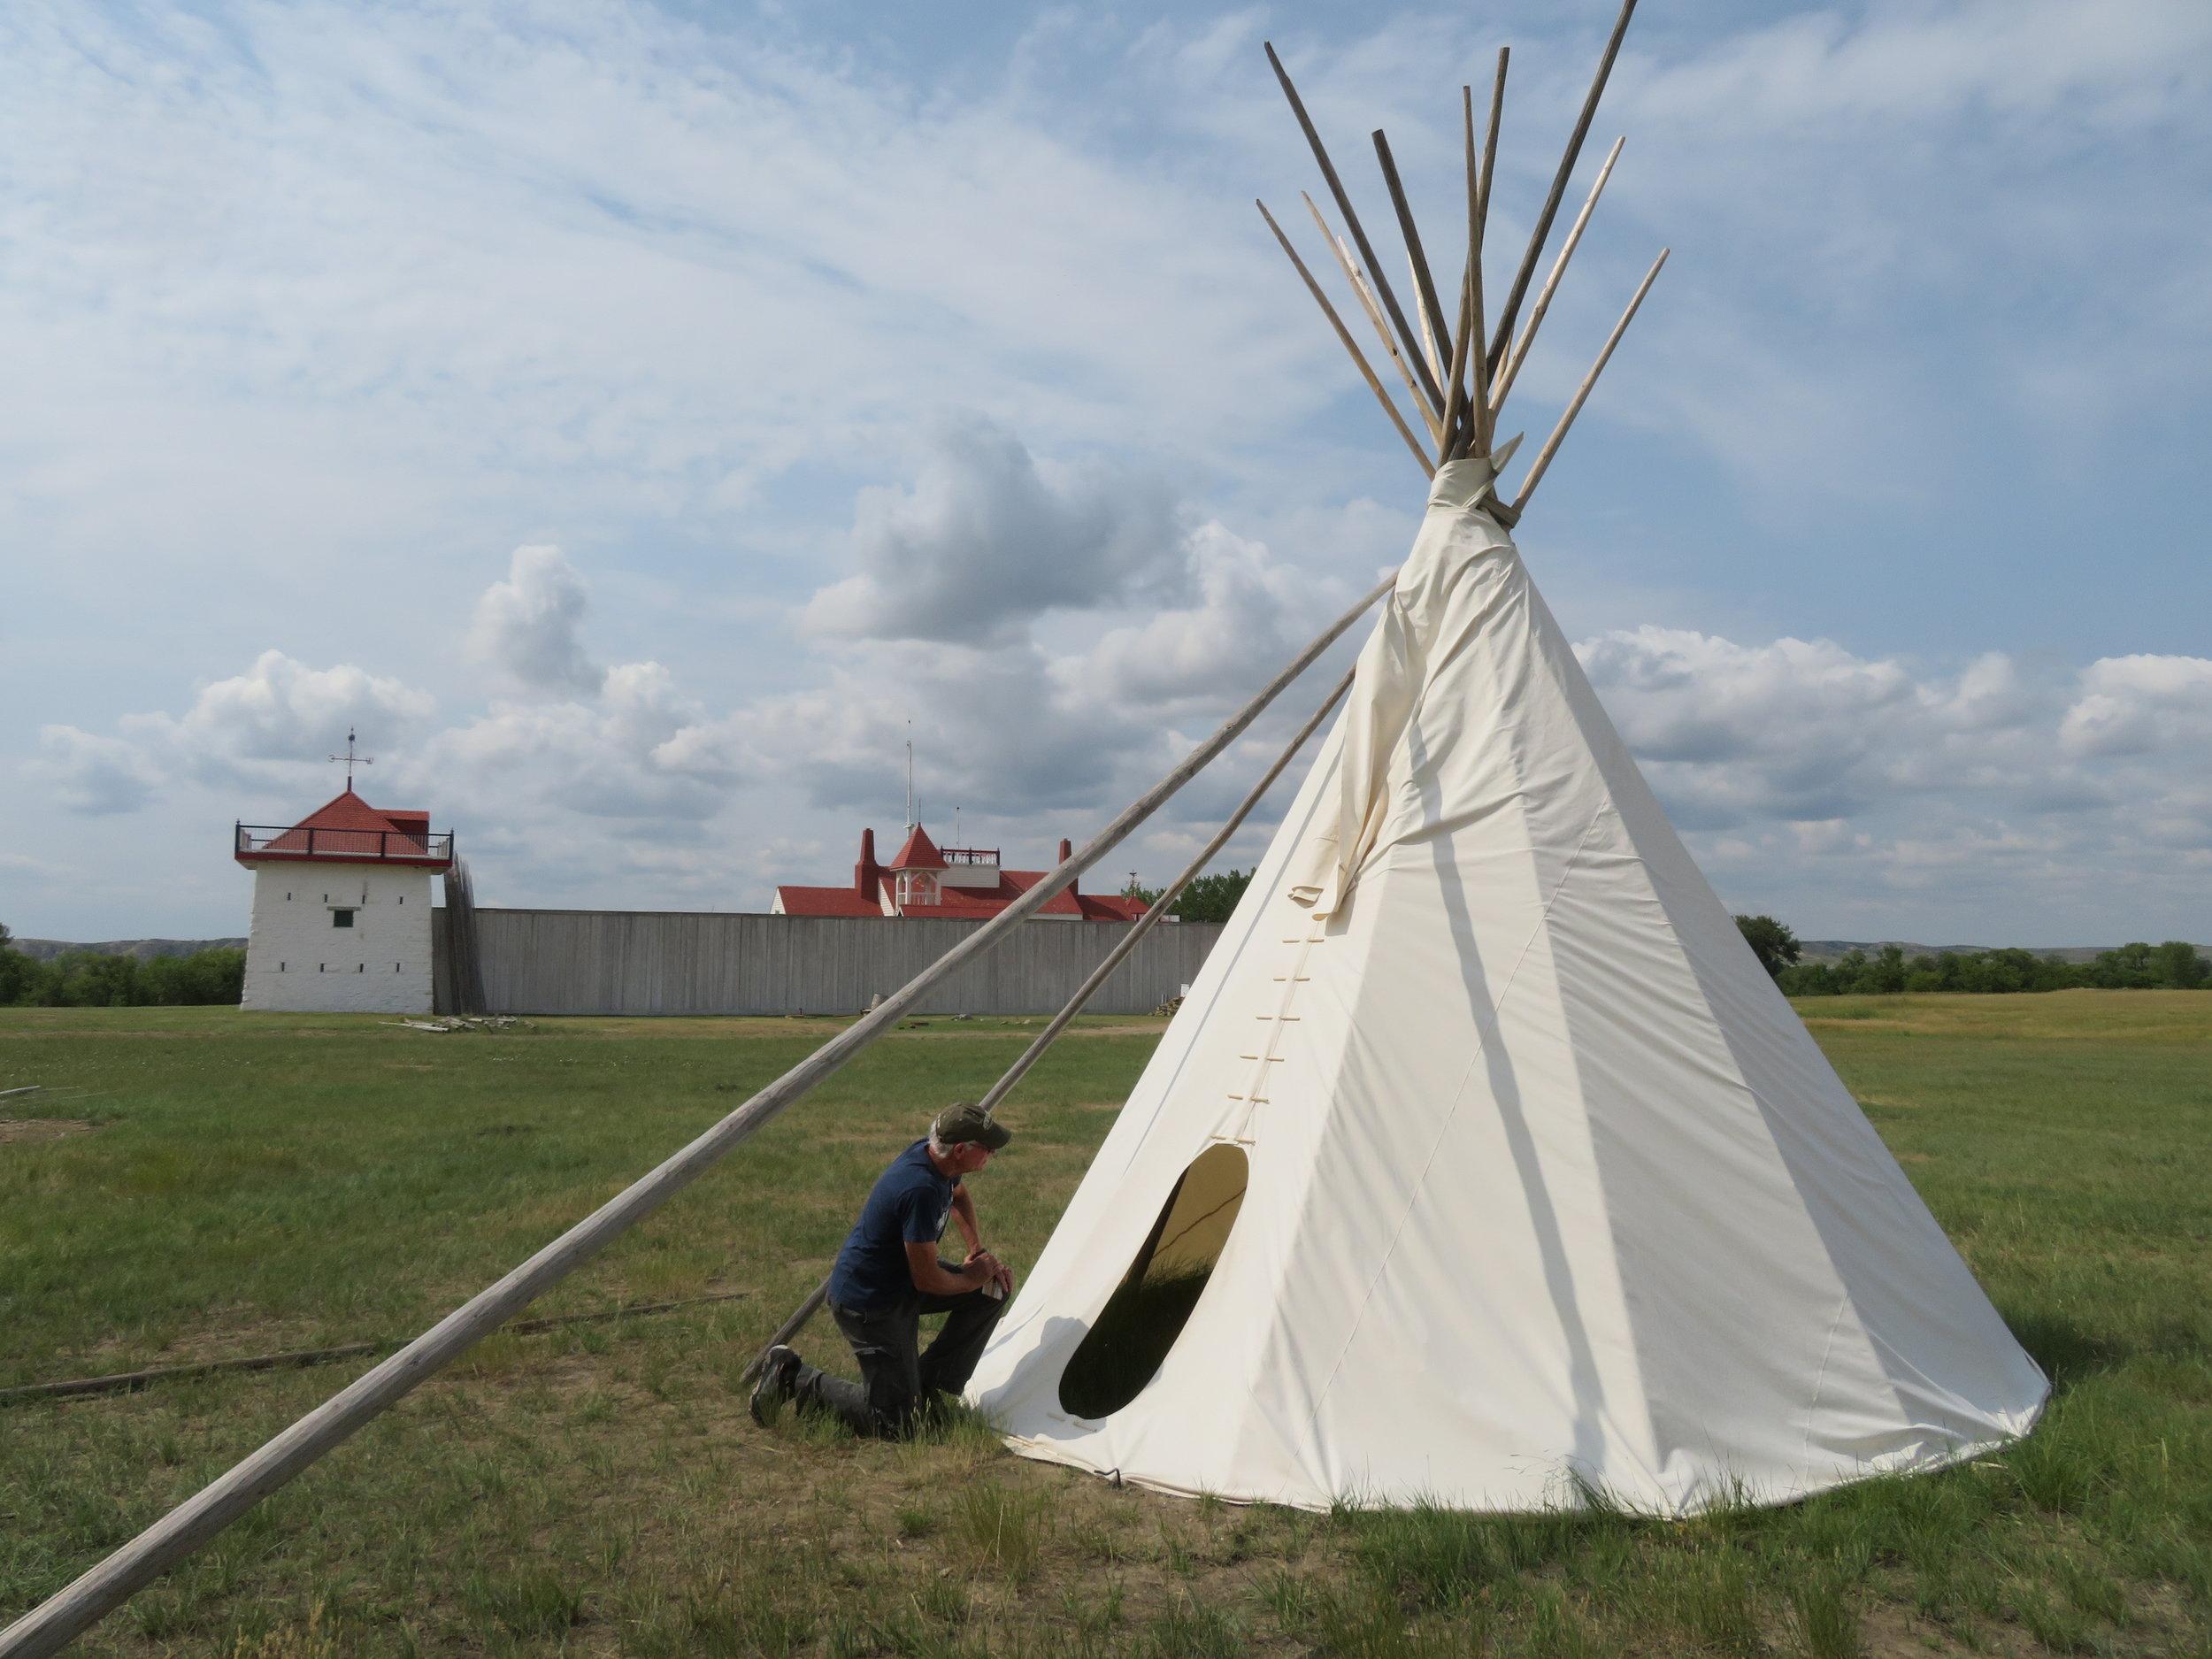 Fort union NHS  - North Dakota - August - 2018